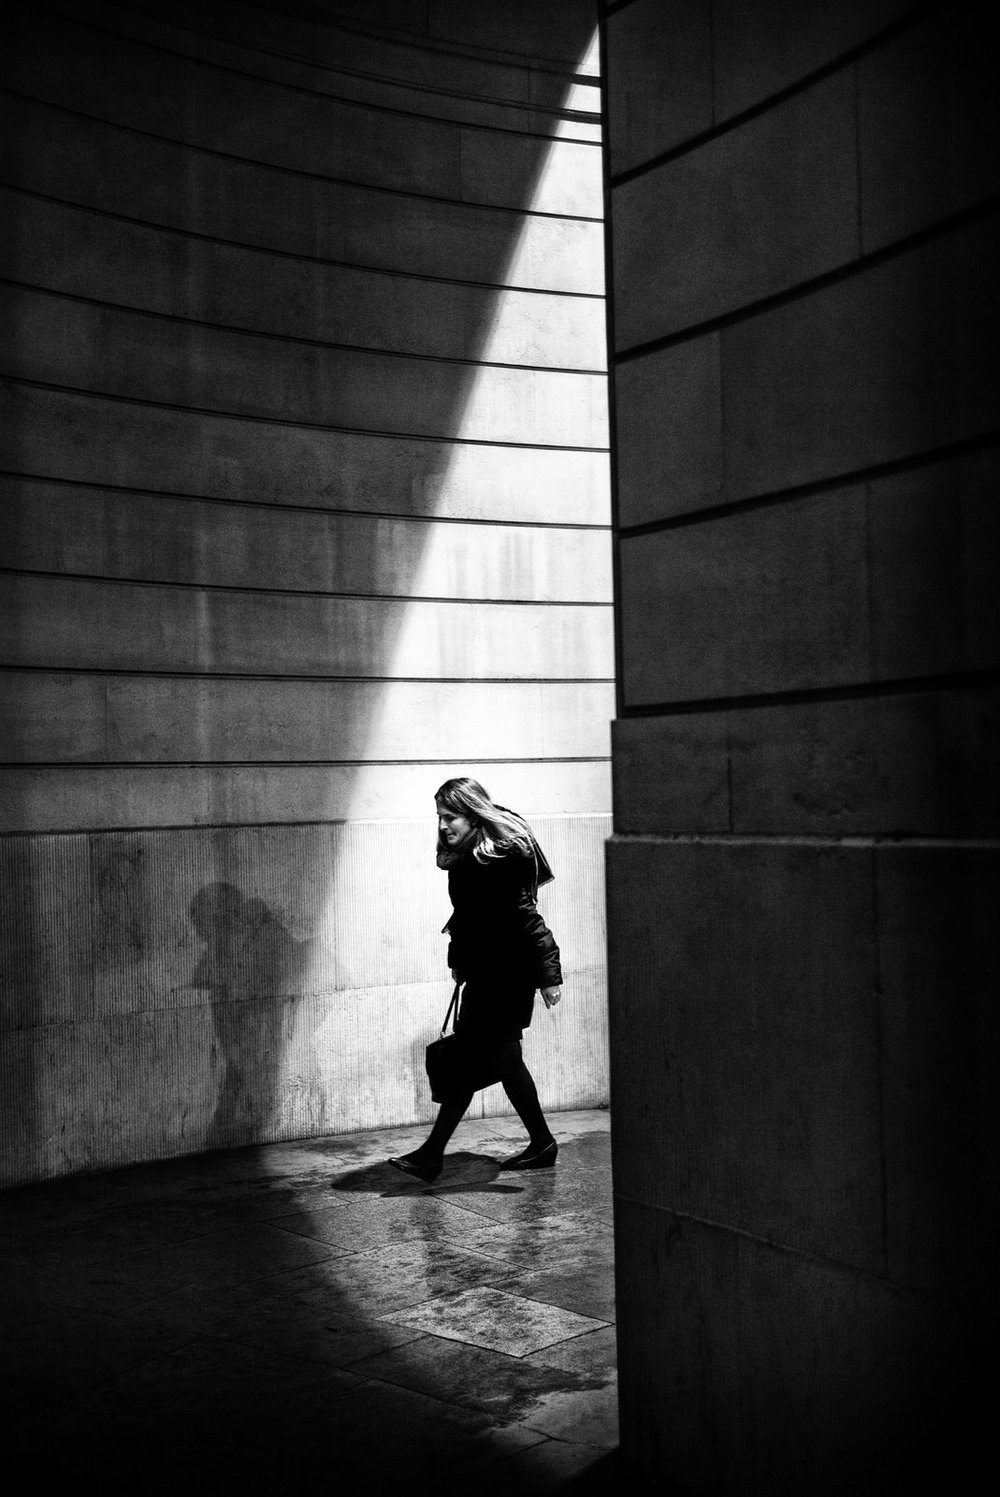 Alan Schaller - London Street Photographer - Metropolis31.jpg